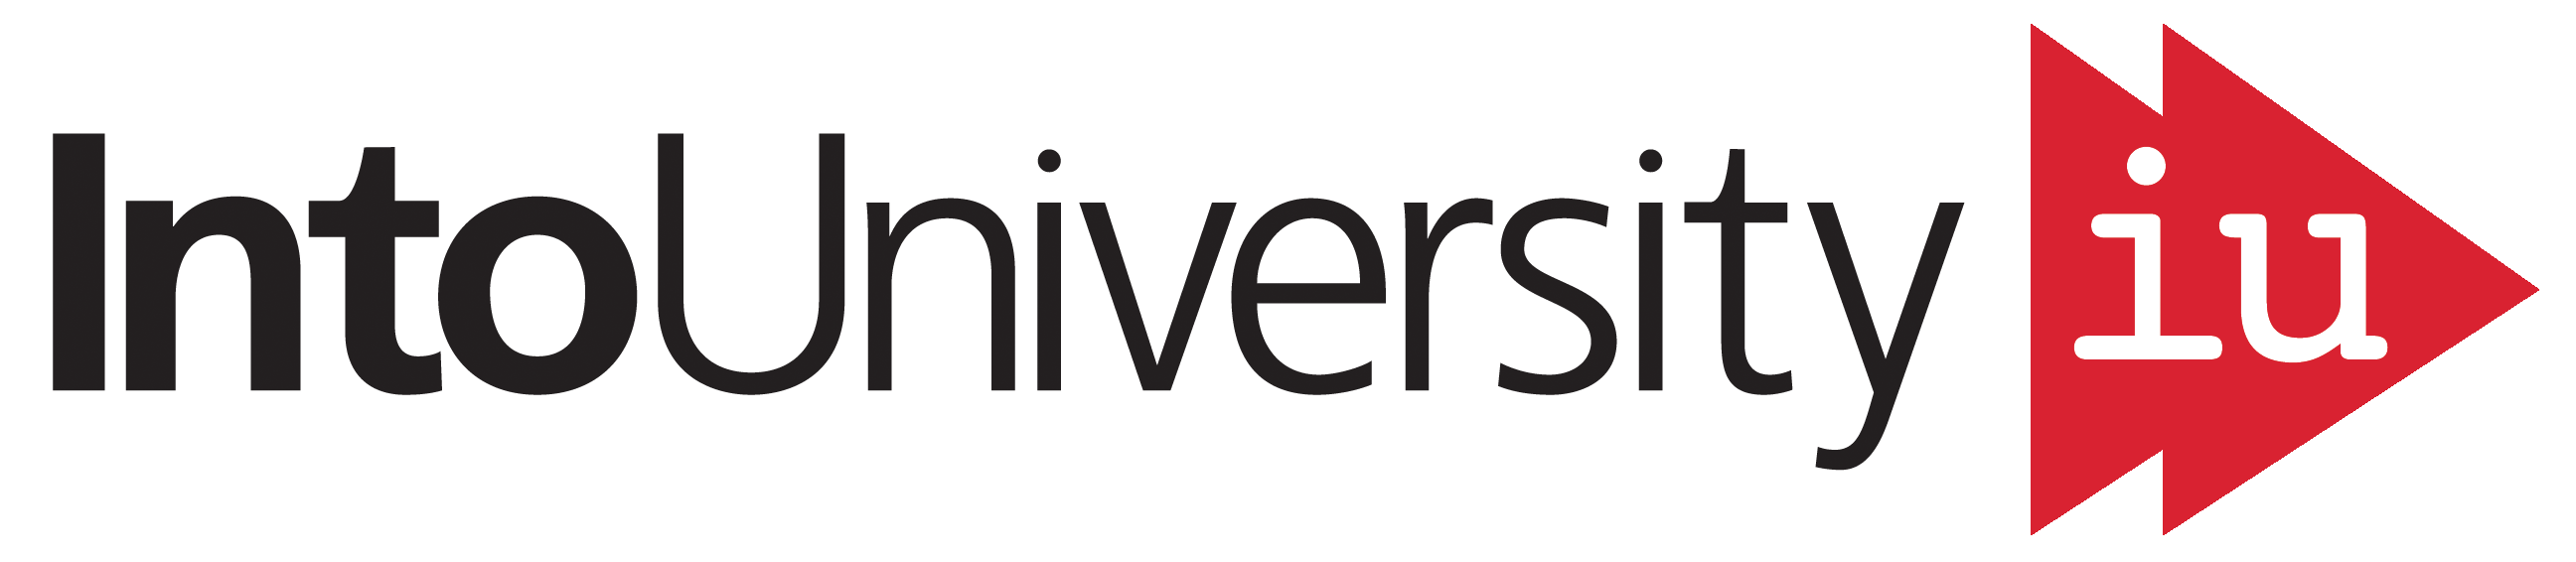 intouniversity-logo